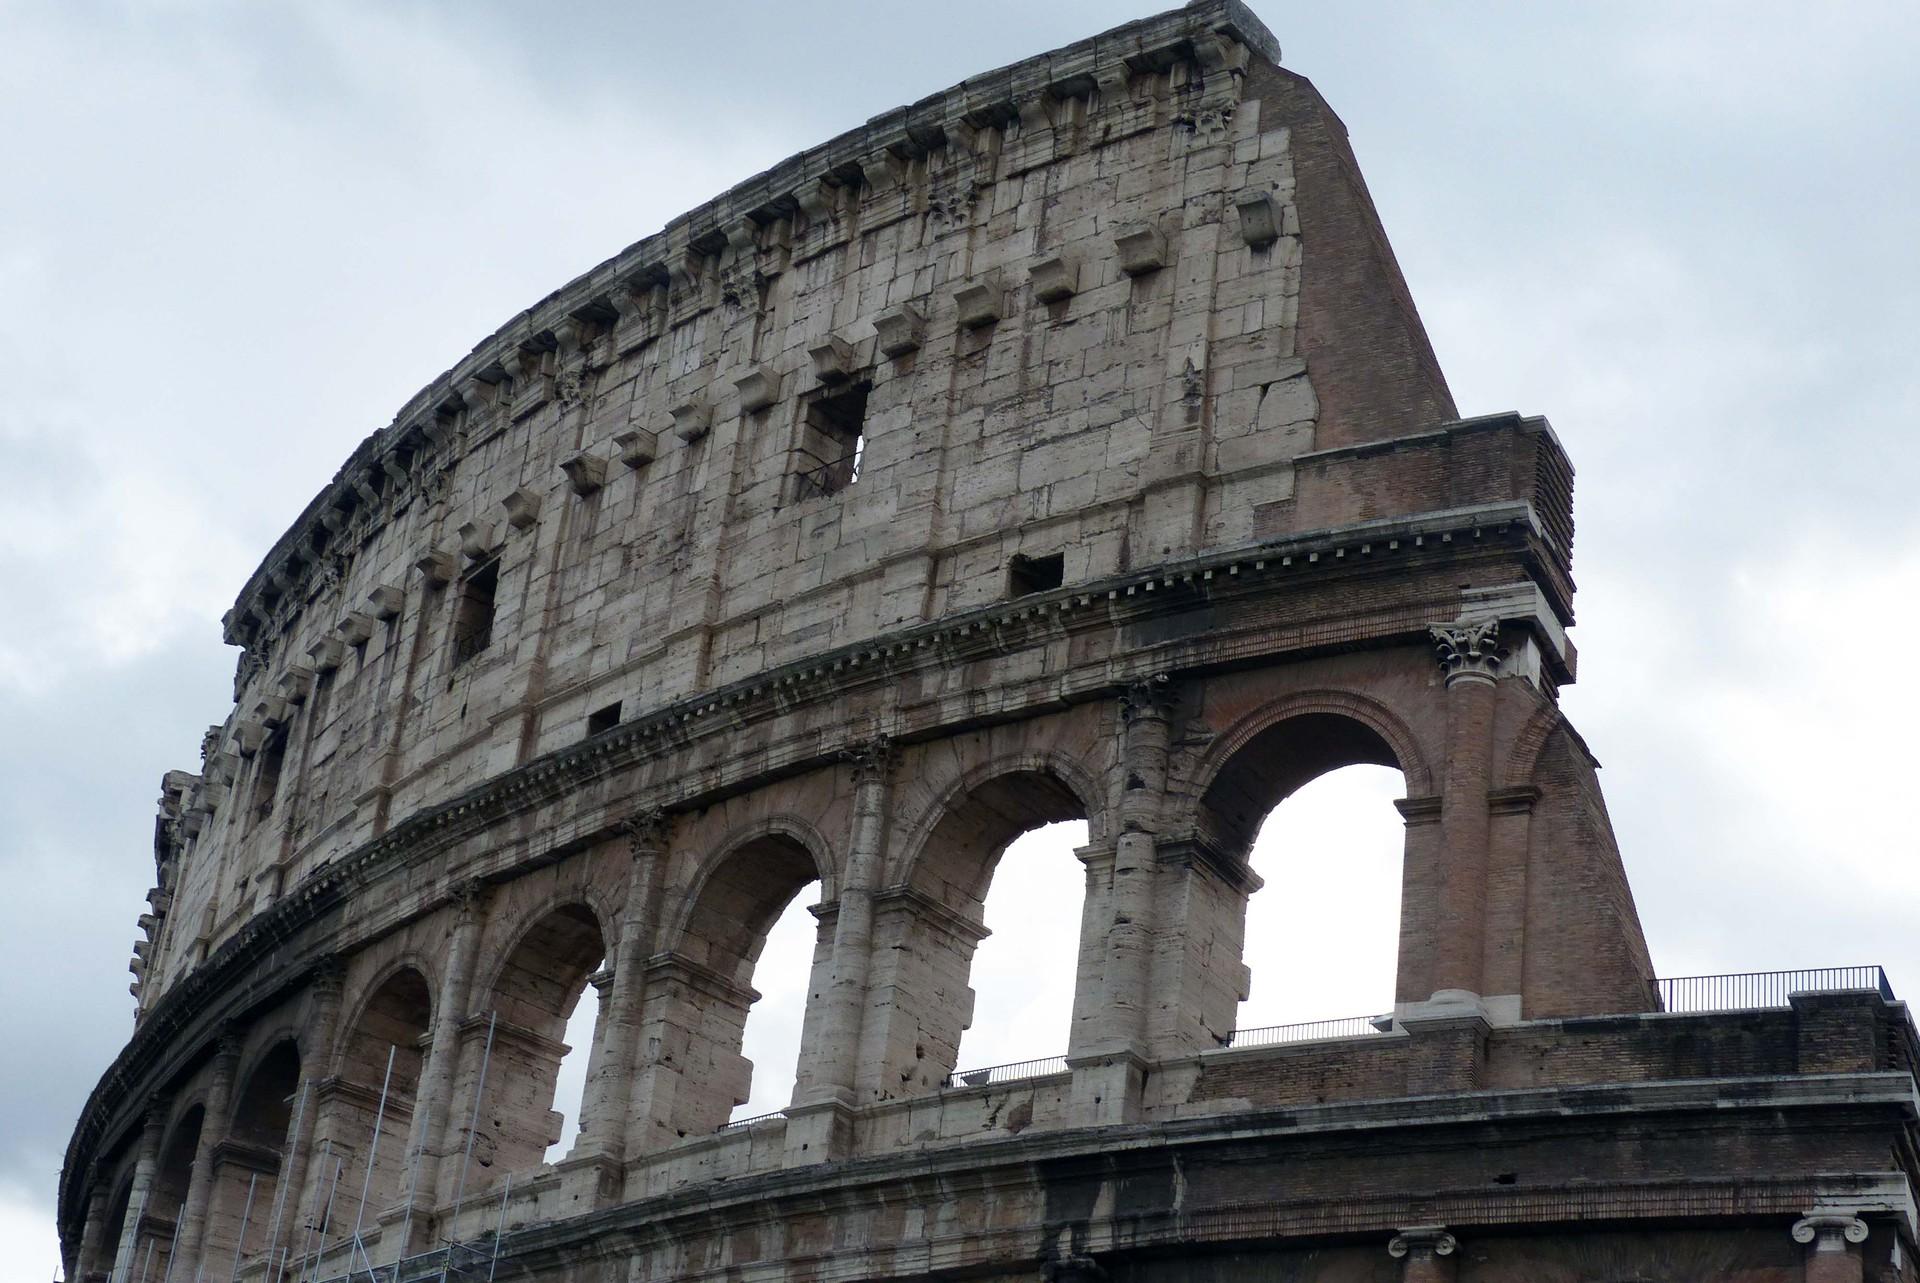 Best of Italy 2013 153-4000x2672.jpg